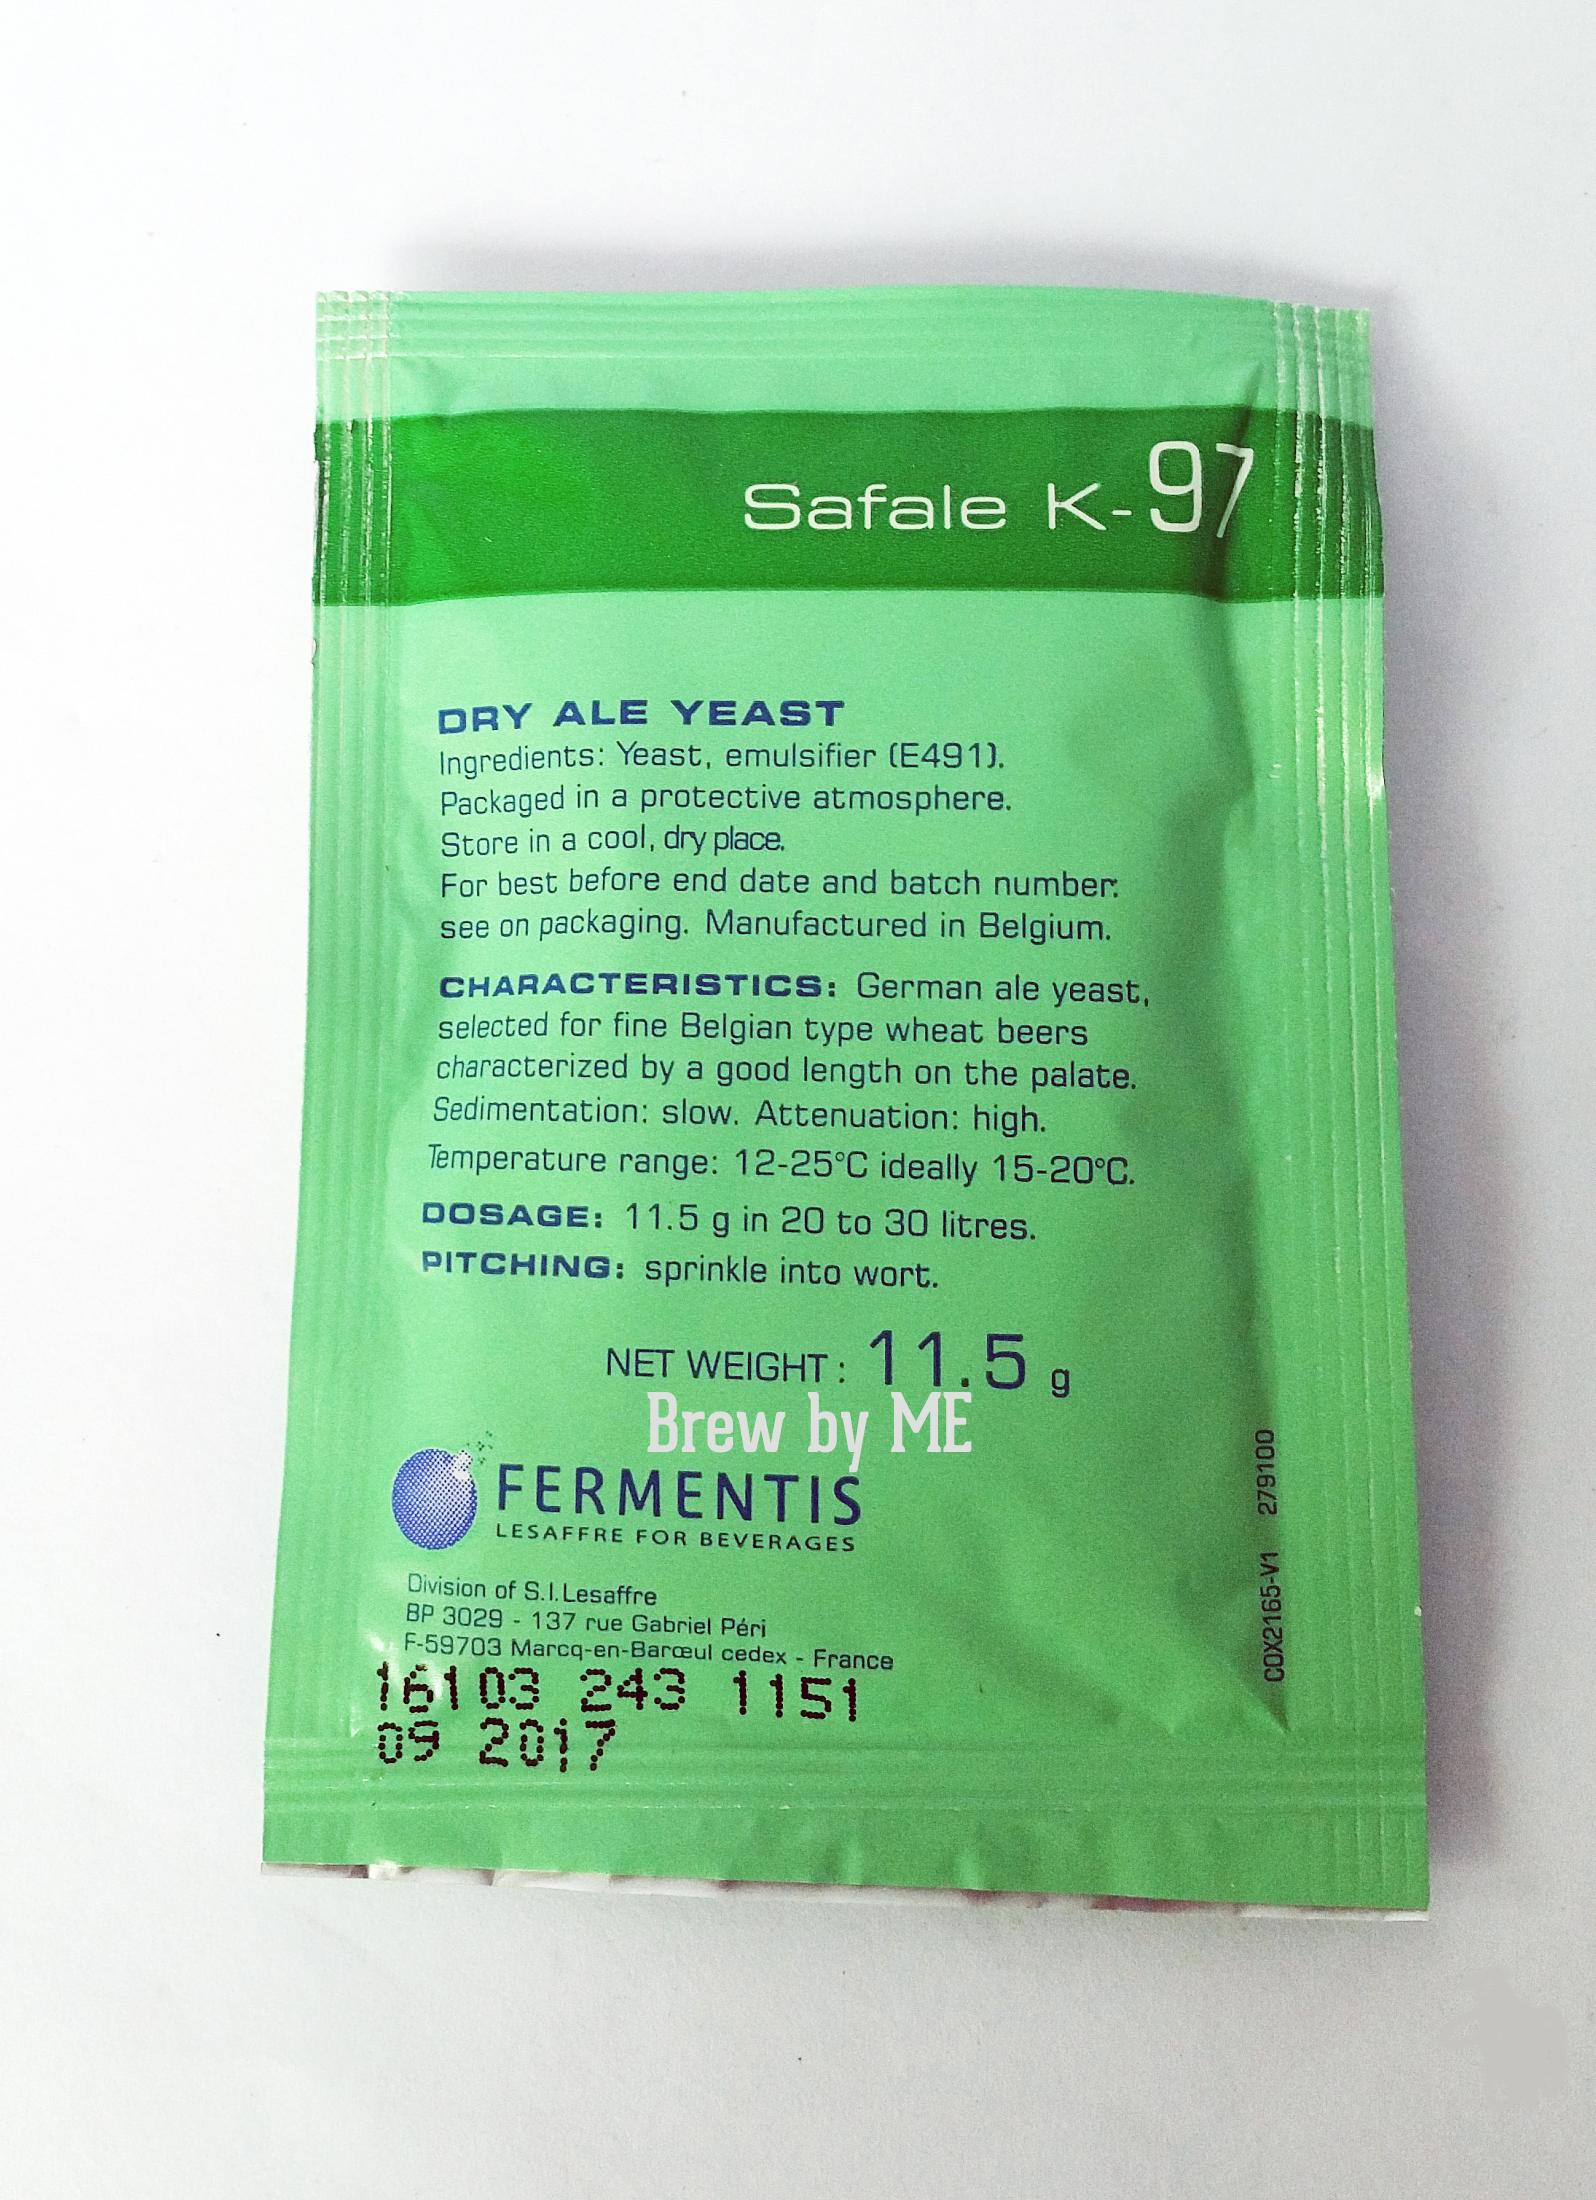 Fermentis Safale K-97